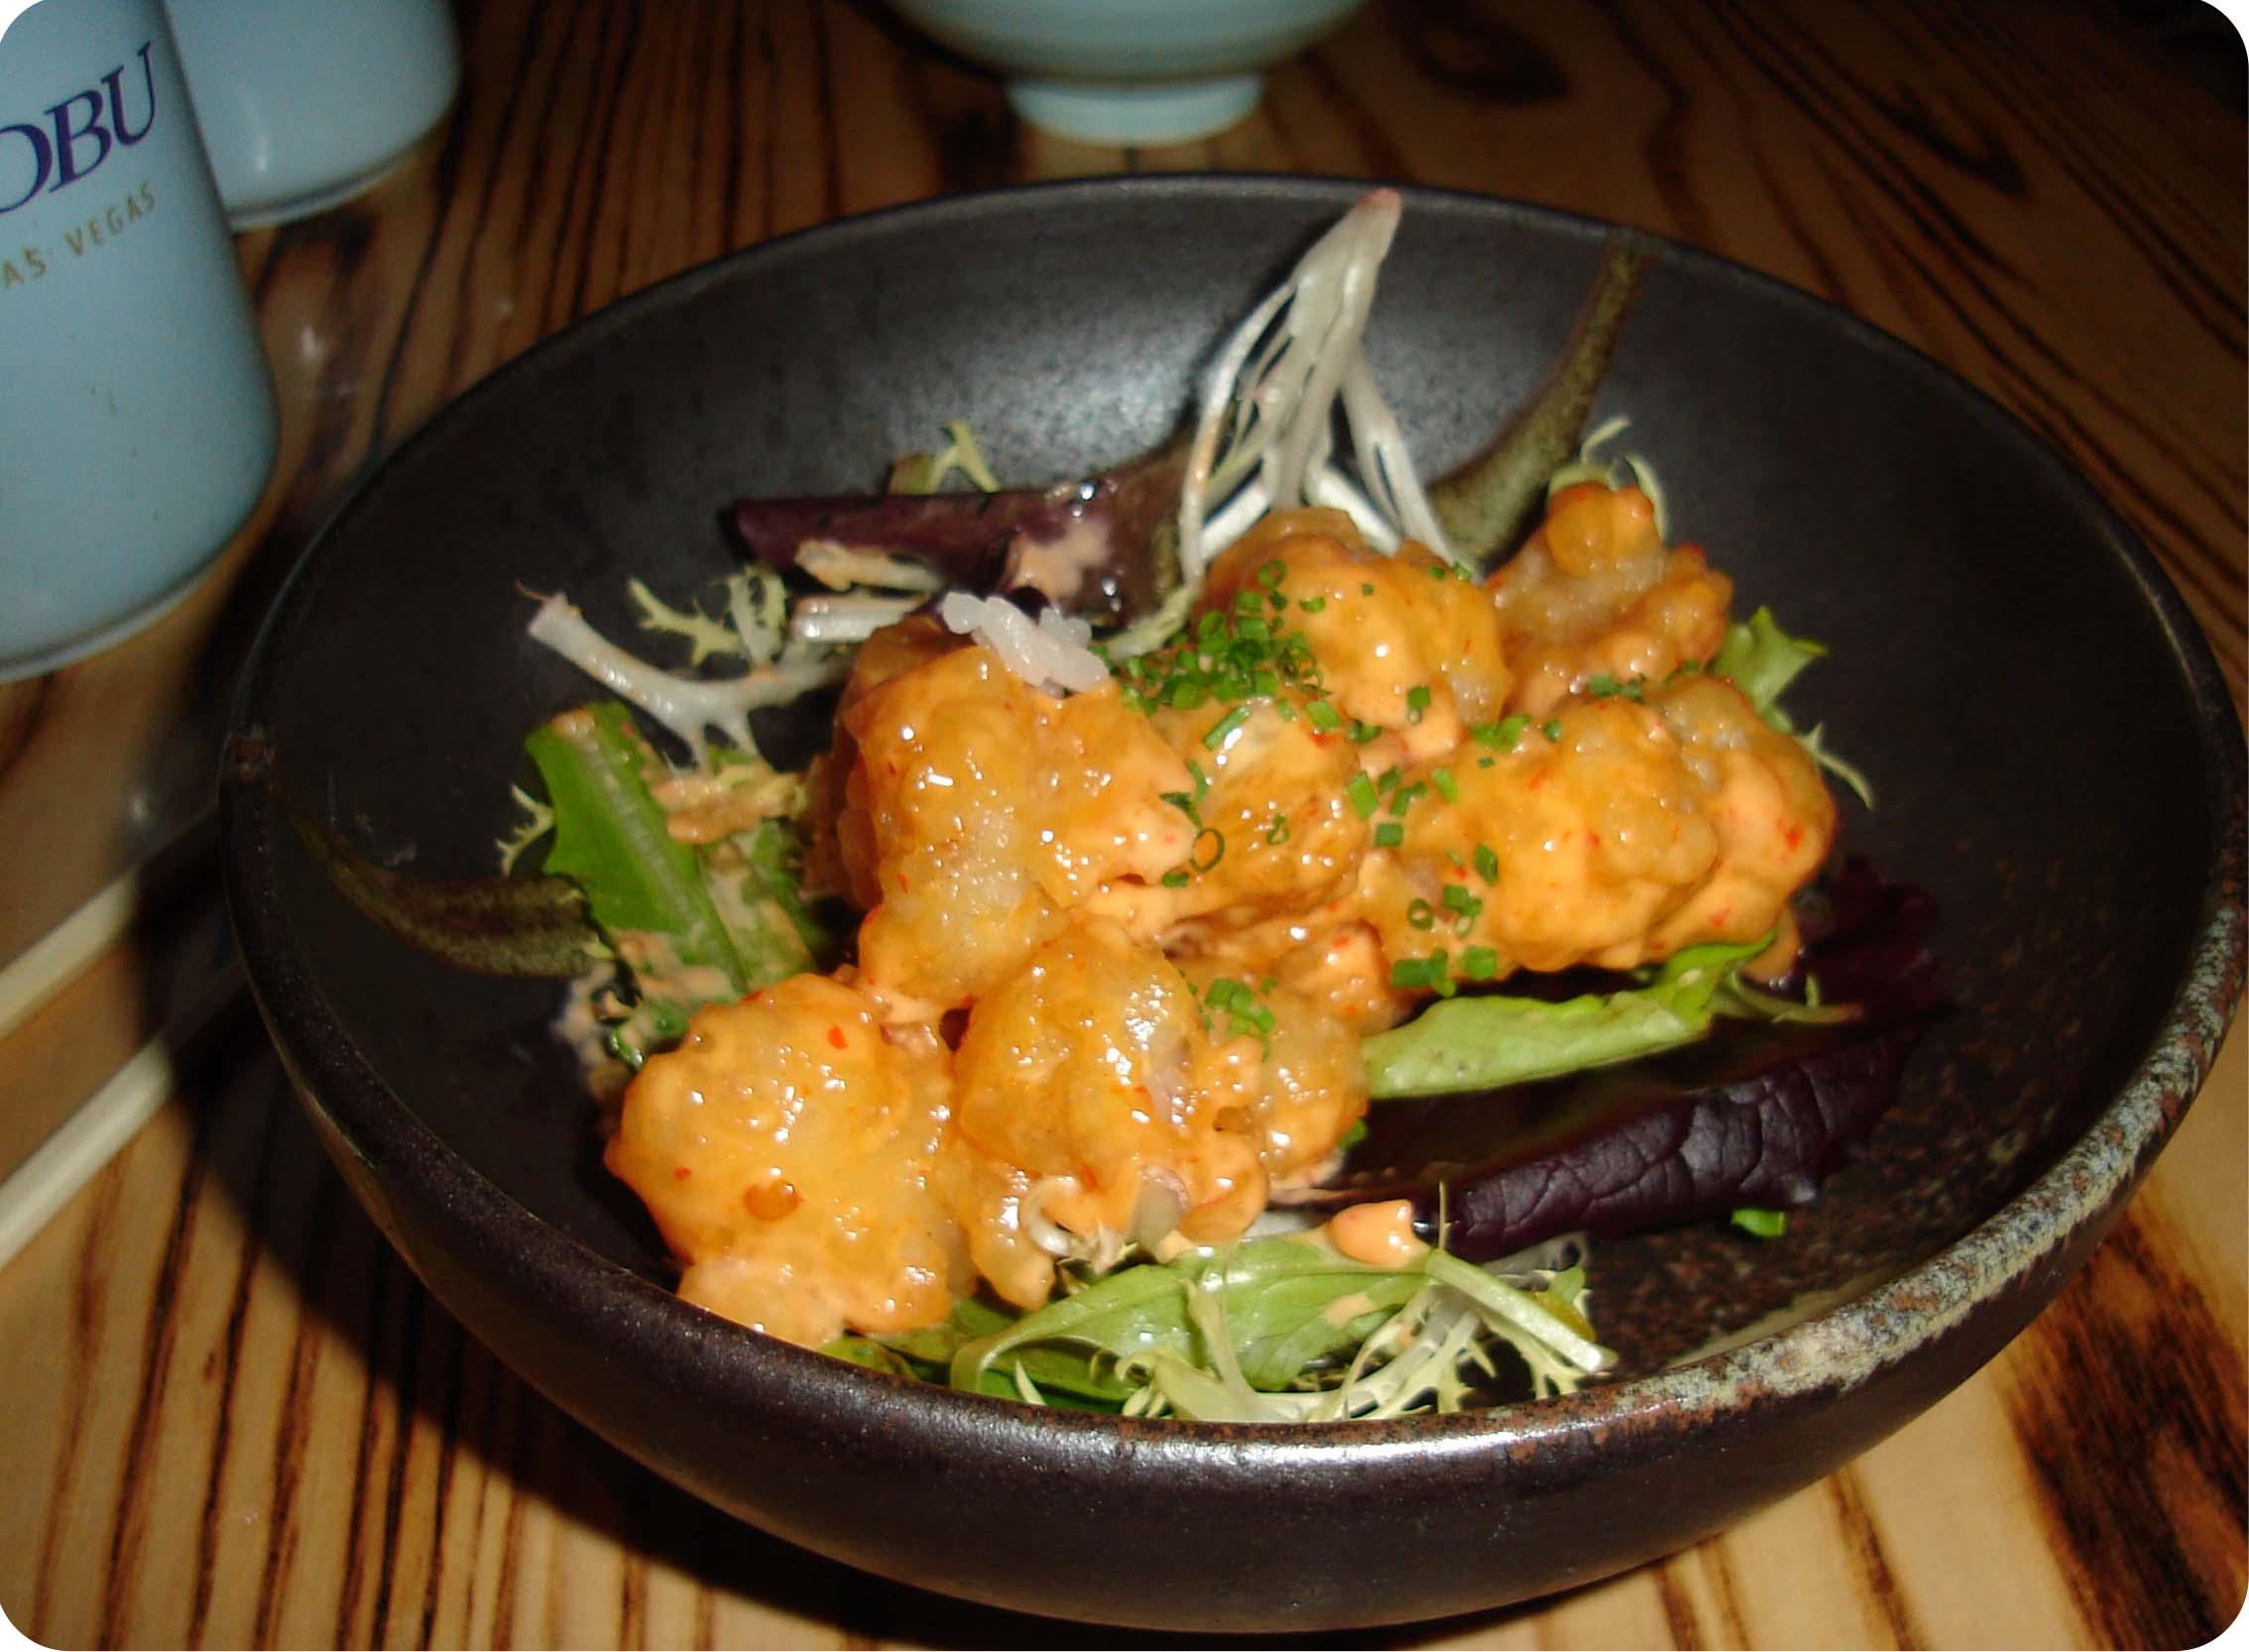 Rock Shrimp in creamy-spicy sauce